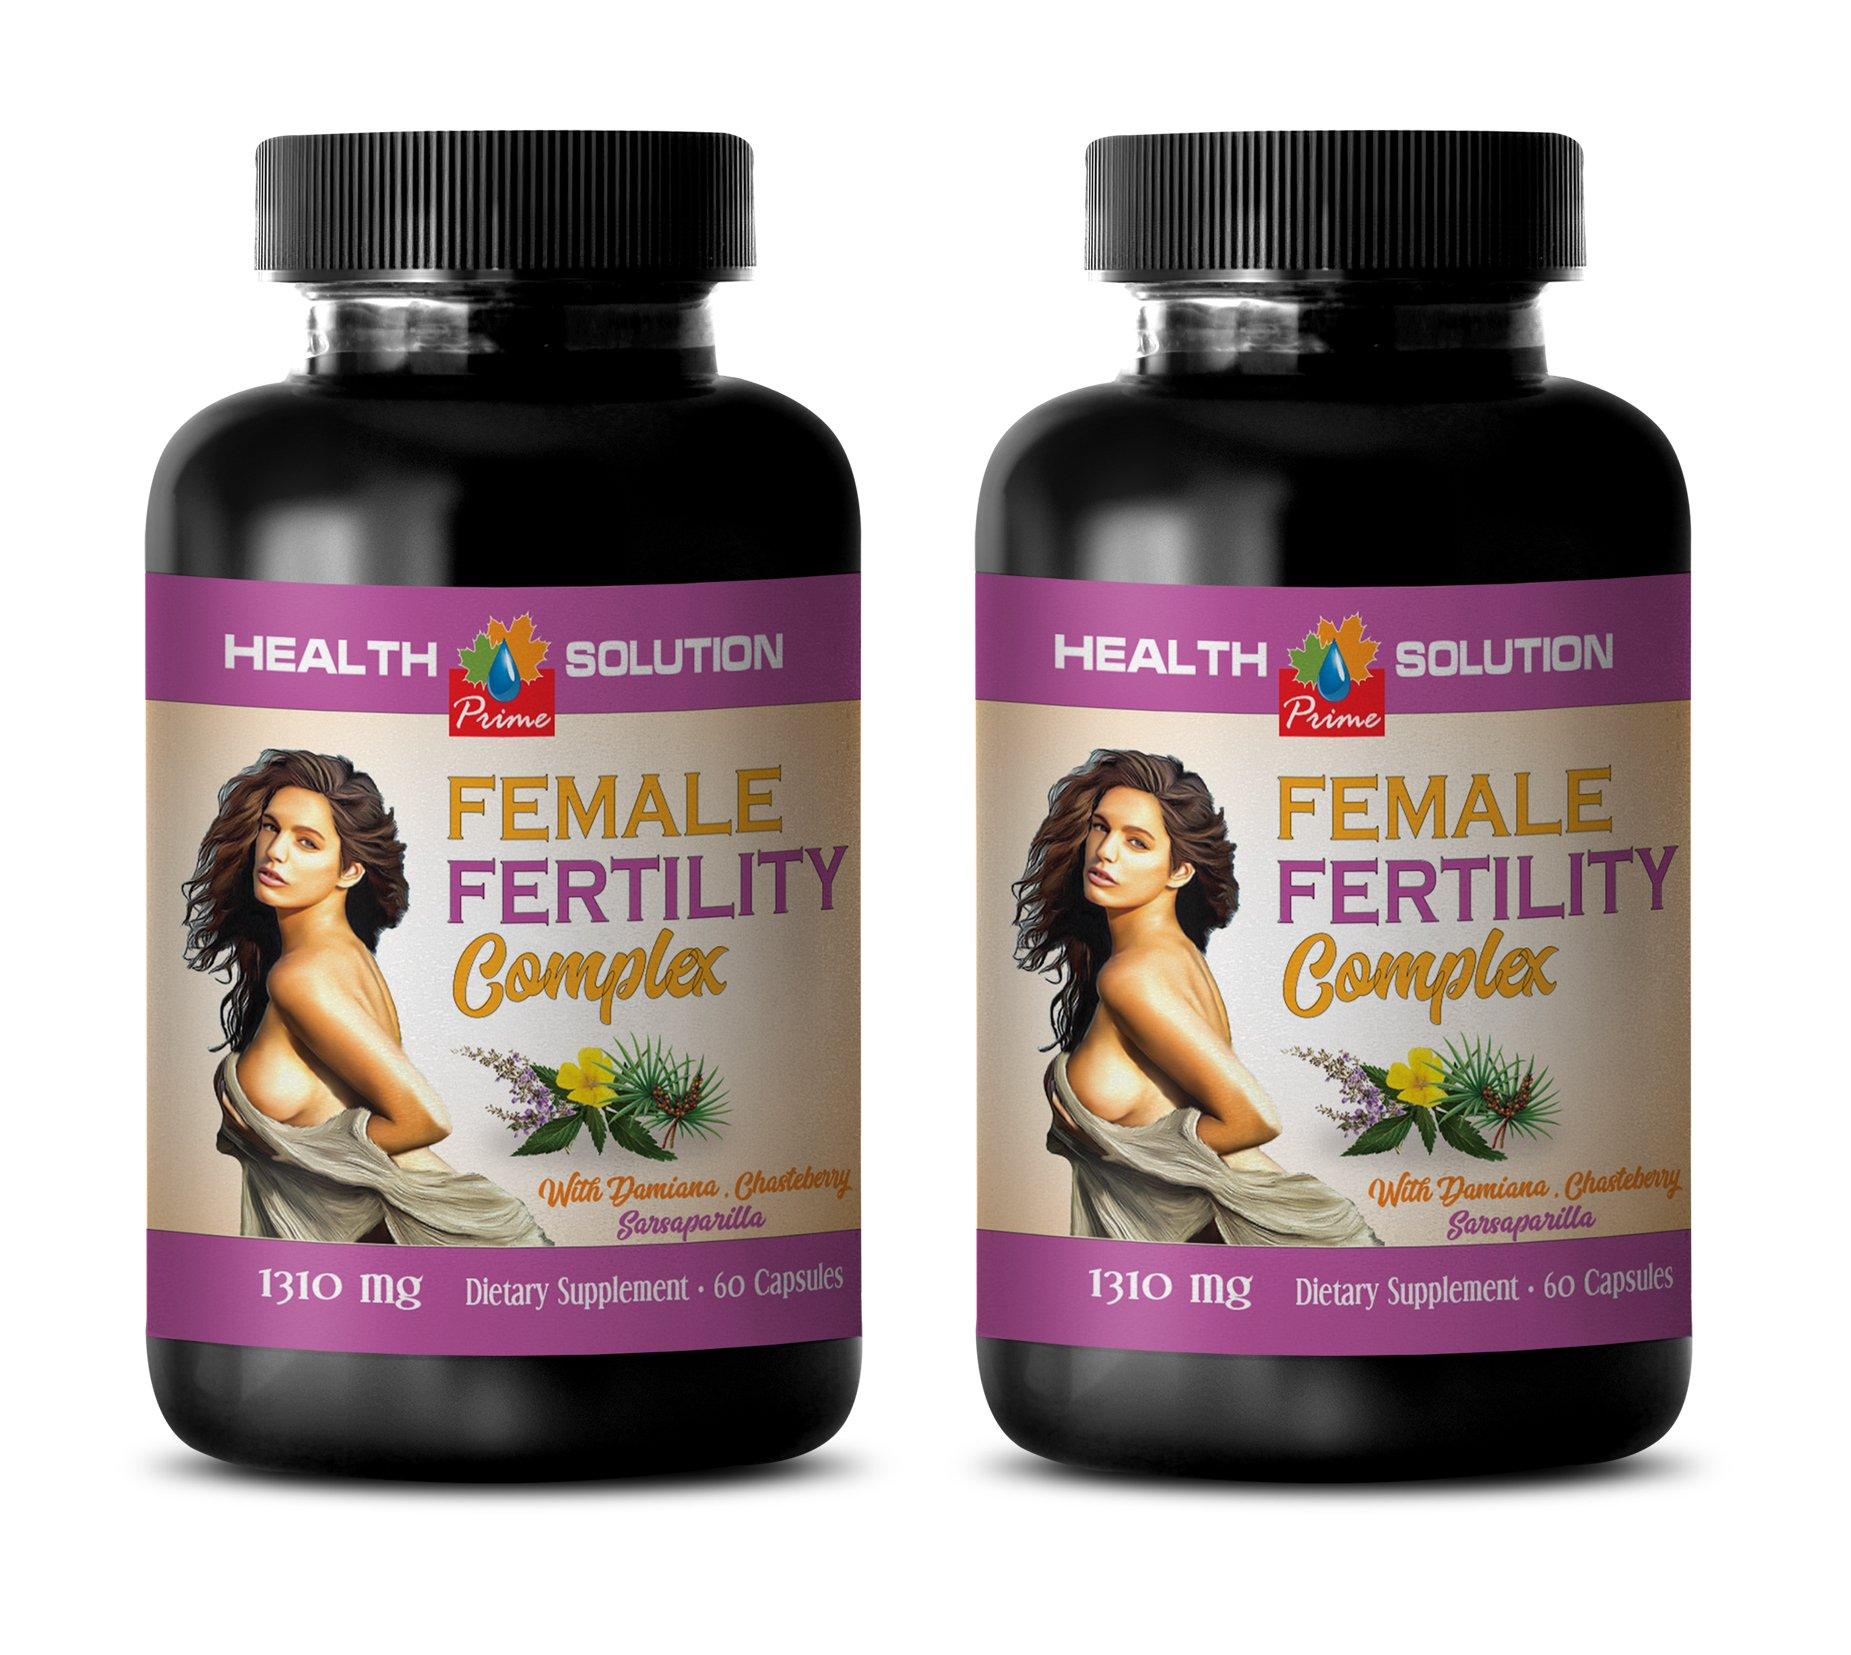 libido enhancer for women - FEMALE FERTILITY COMPLEX - damiana capsules - 2 Bottles 120 Capsules by Health Solution Prime